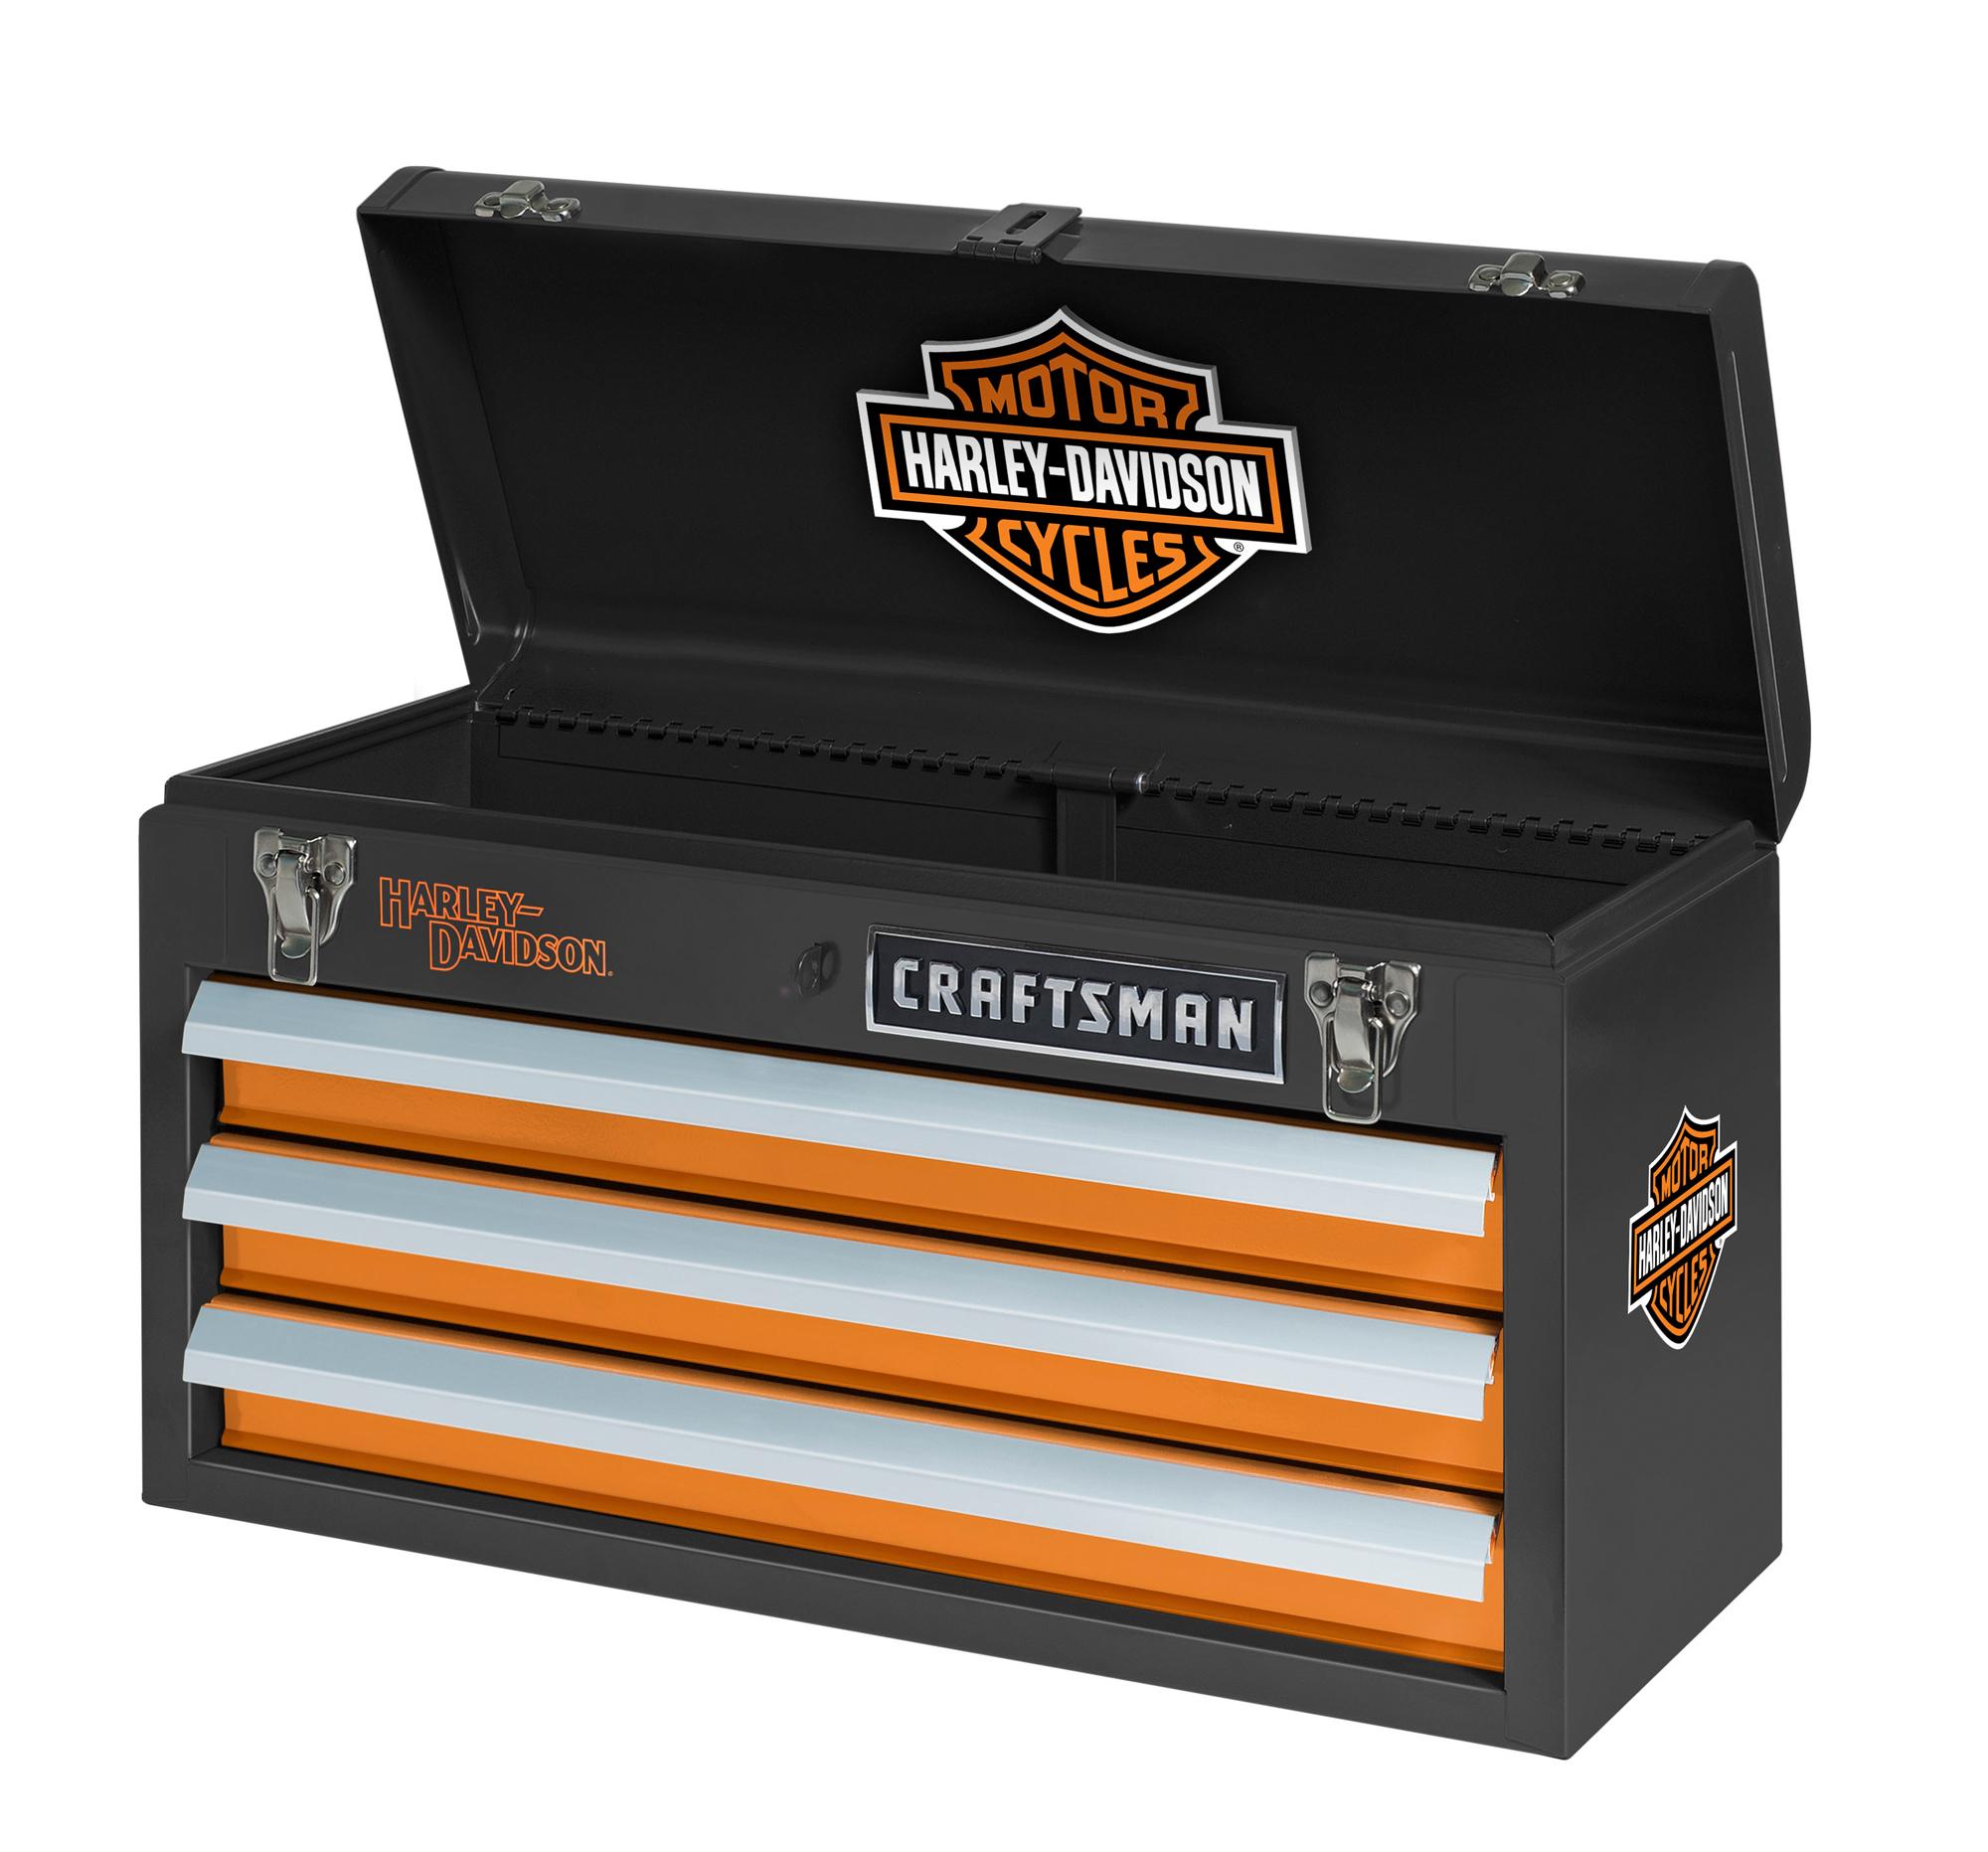 Craftsman Harley-davidson 3 Drawer Portable Tool Chest